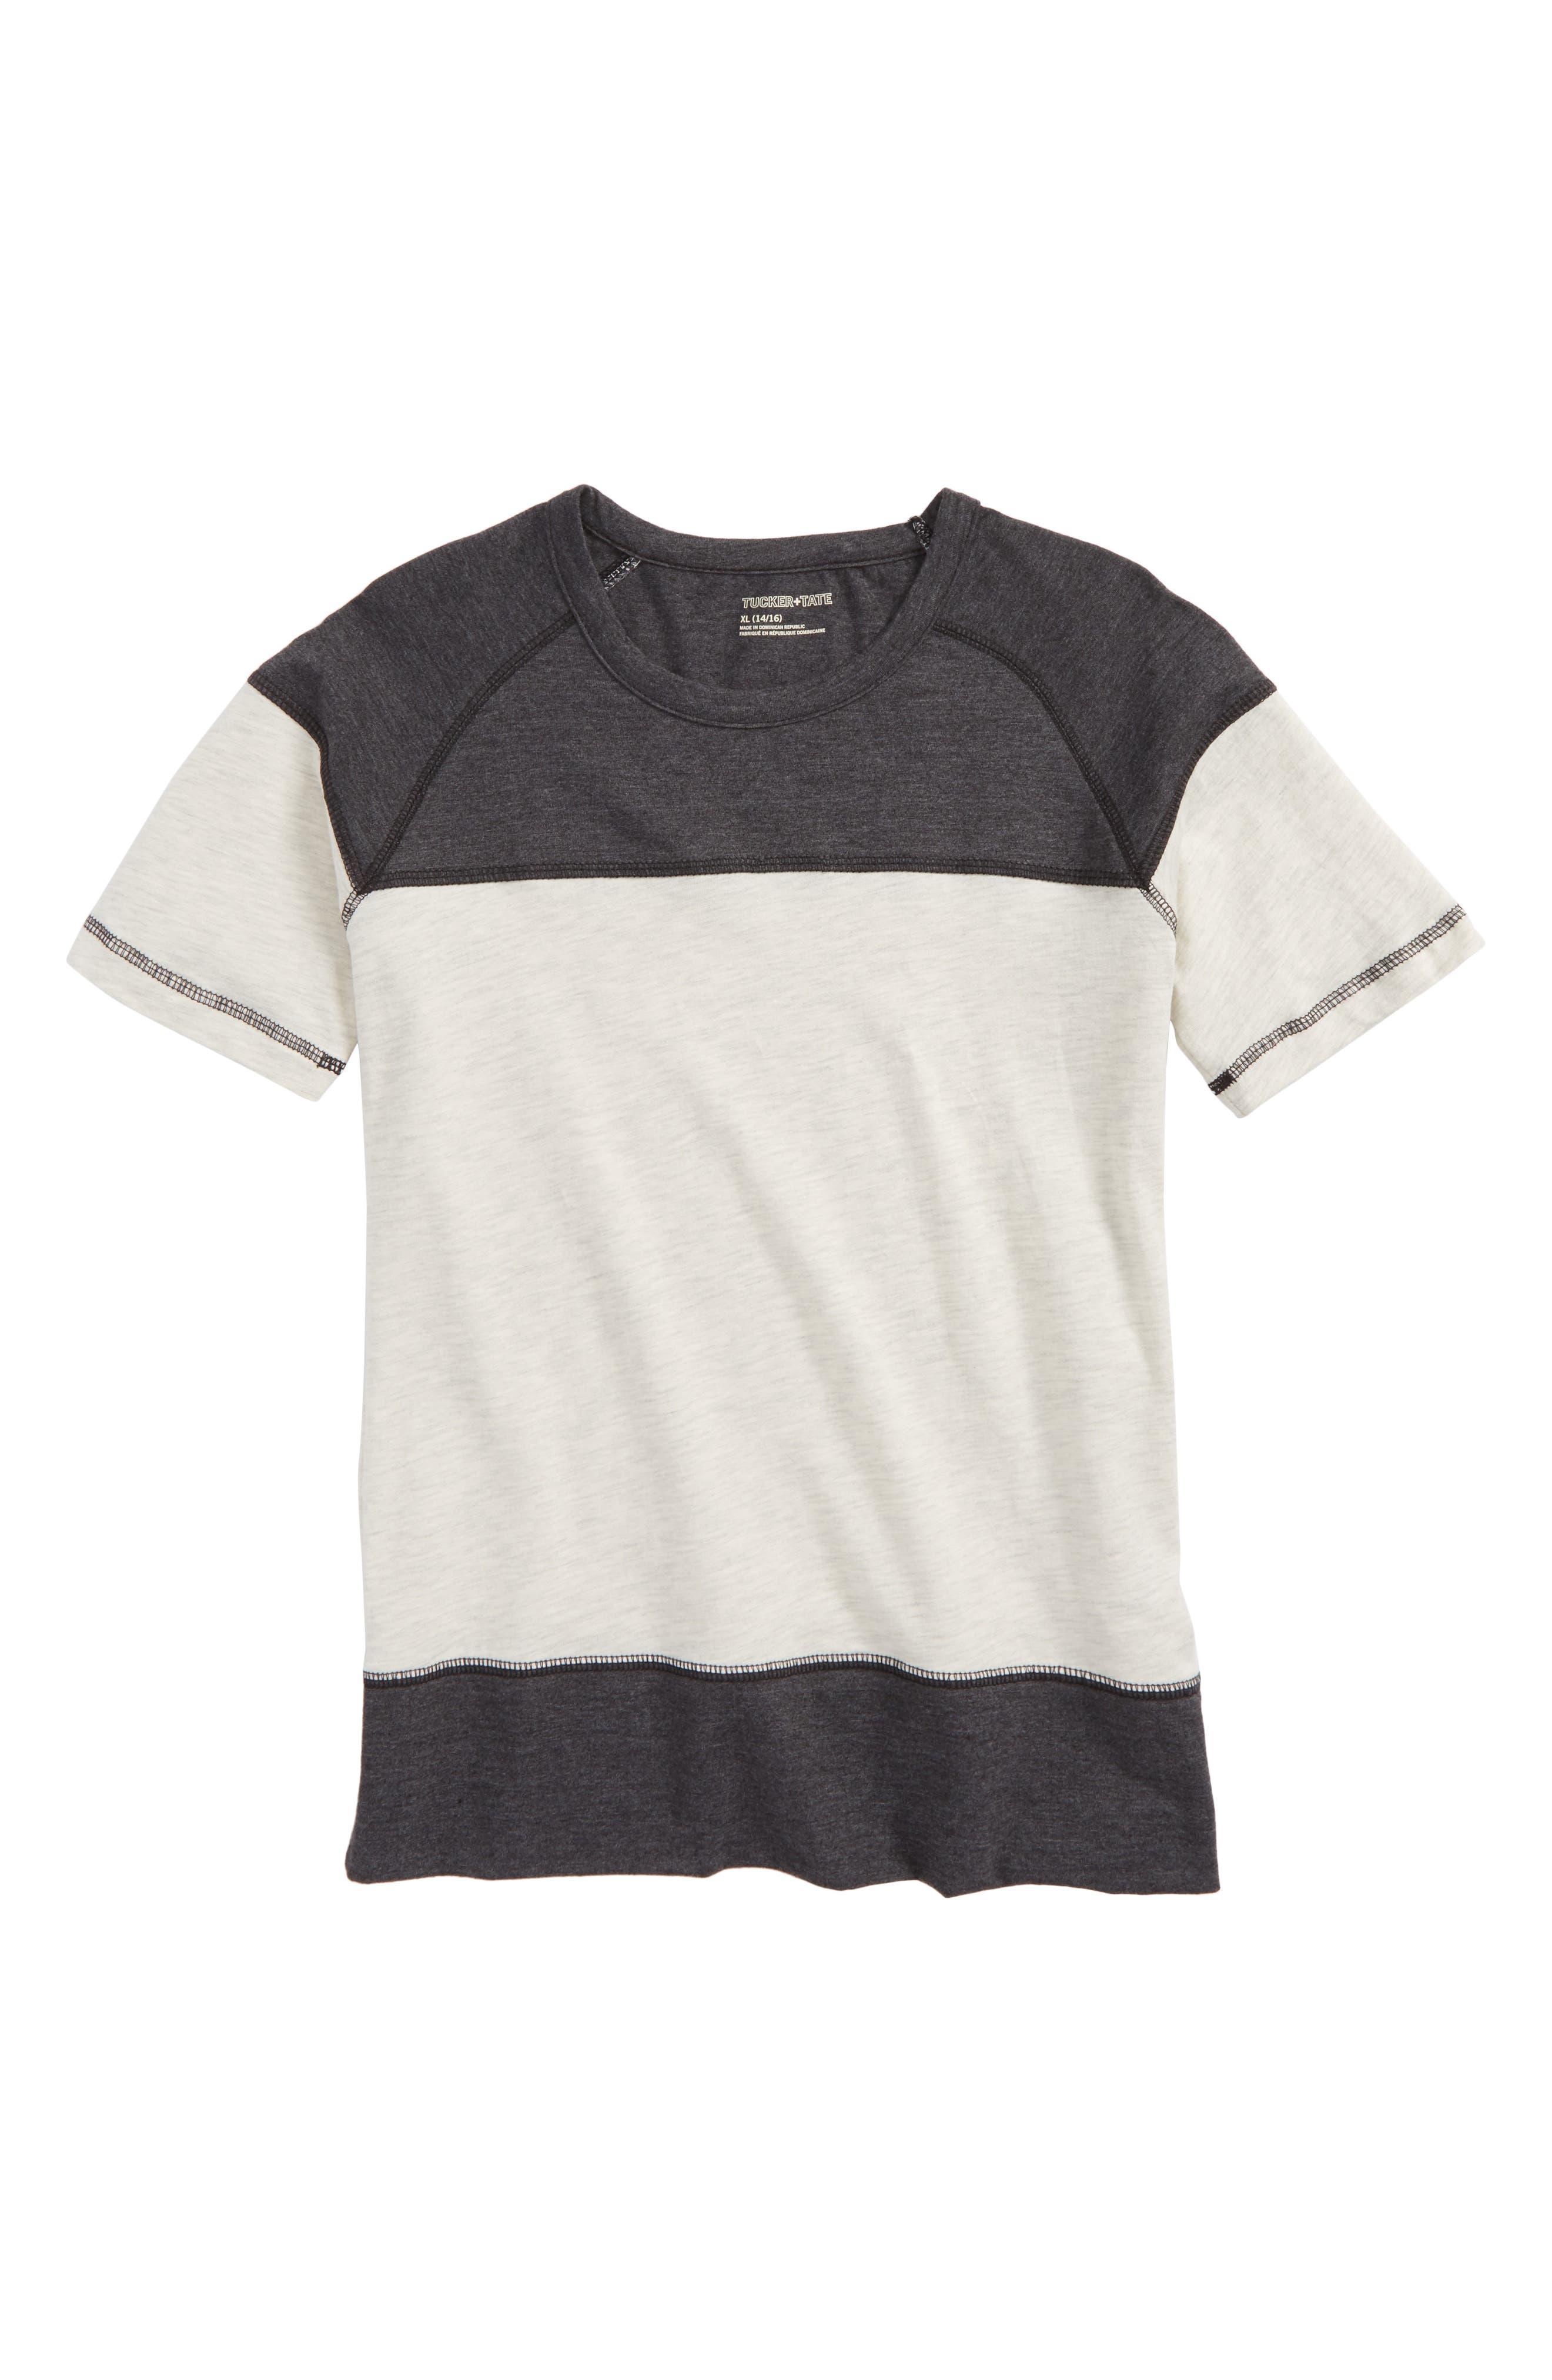 Alternate Image 1 Selected - Tucker + Tate Colorblock T-Shirt (Big Boys)